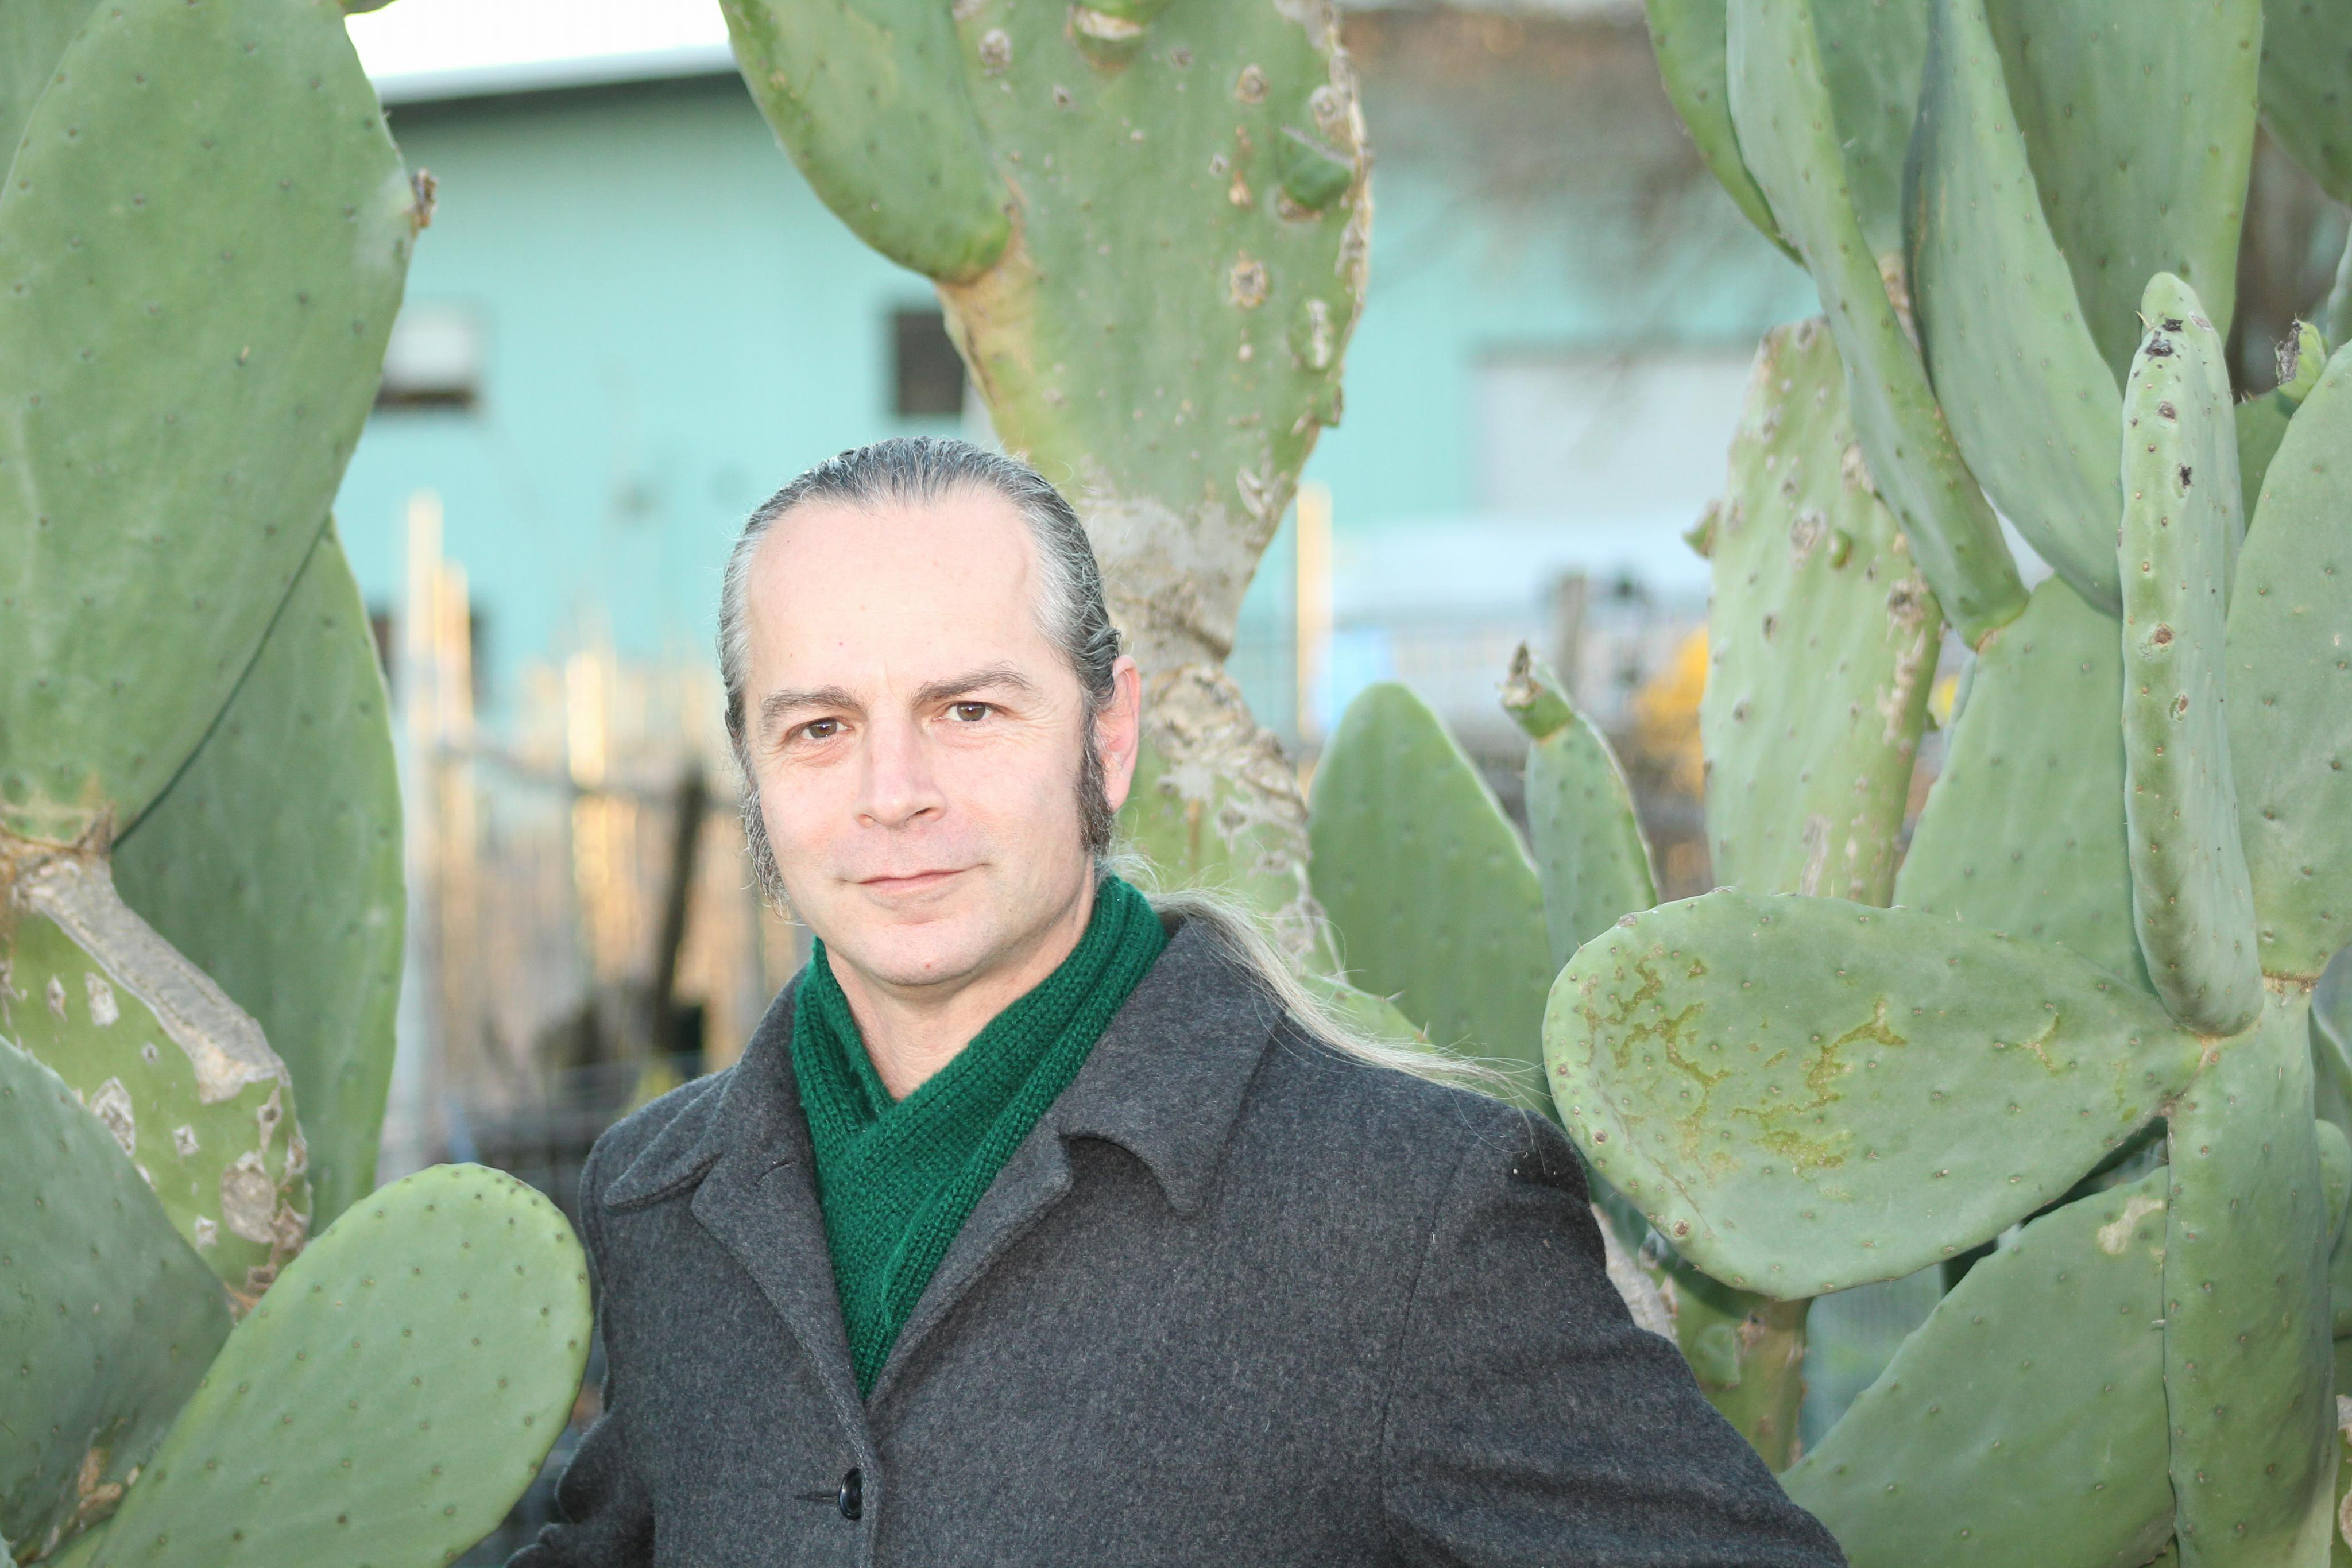 josh_cactus.jpg